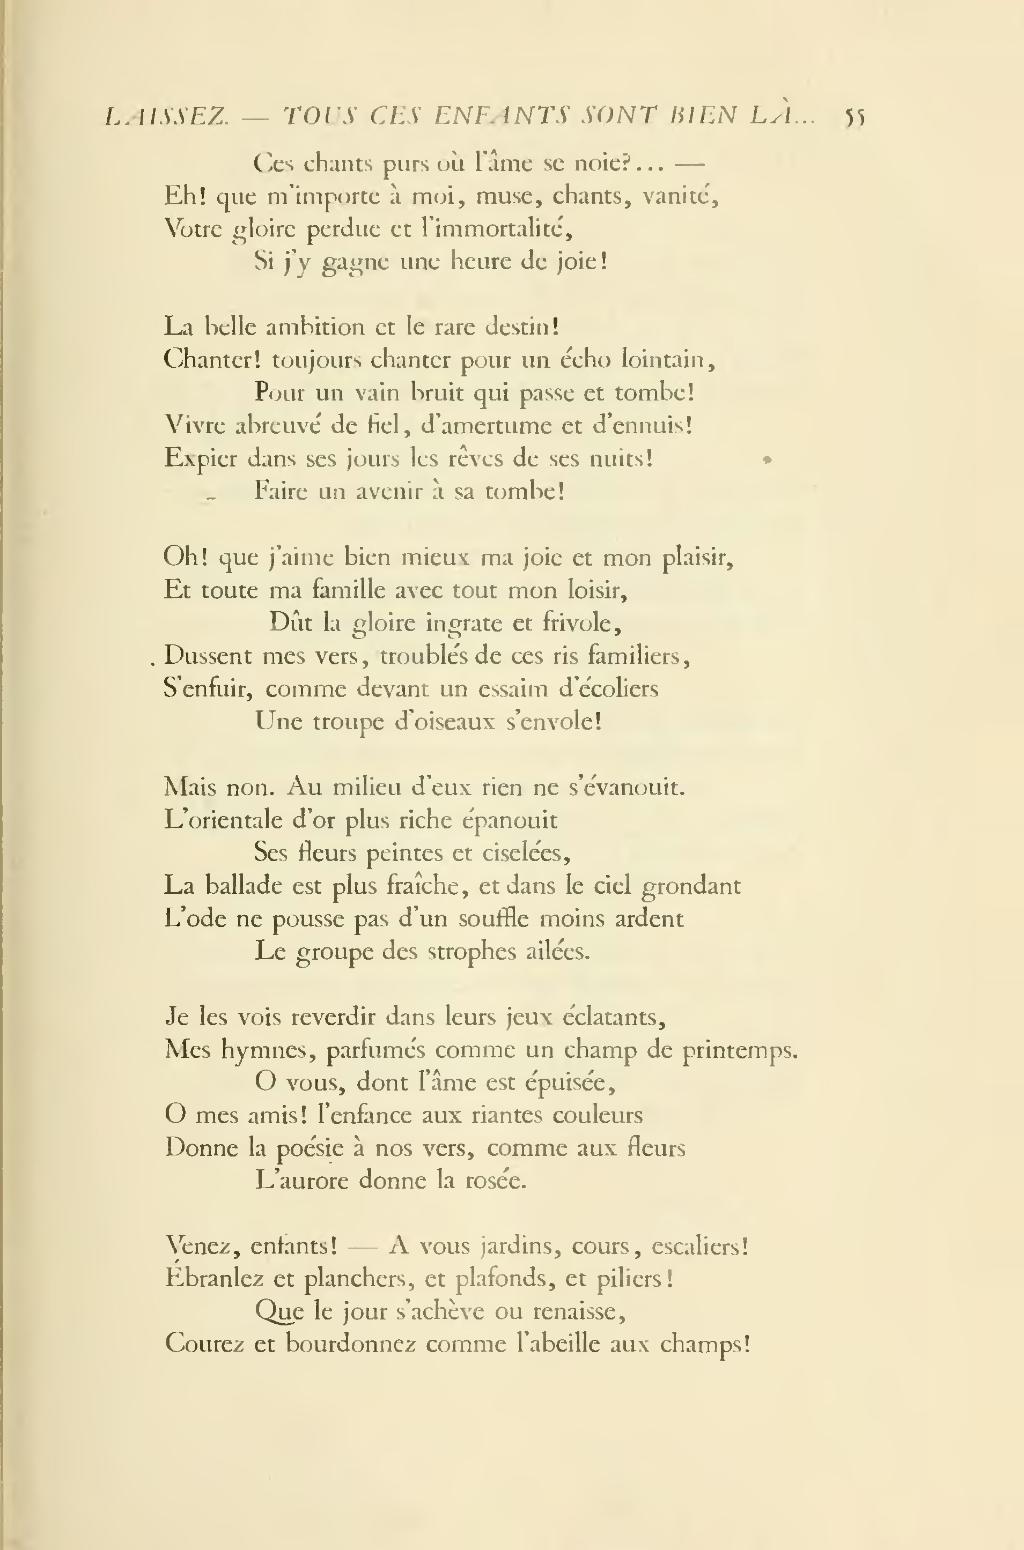 Pagehugo œuvres Complètes Impr Nat Poésie Tome Ii